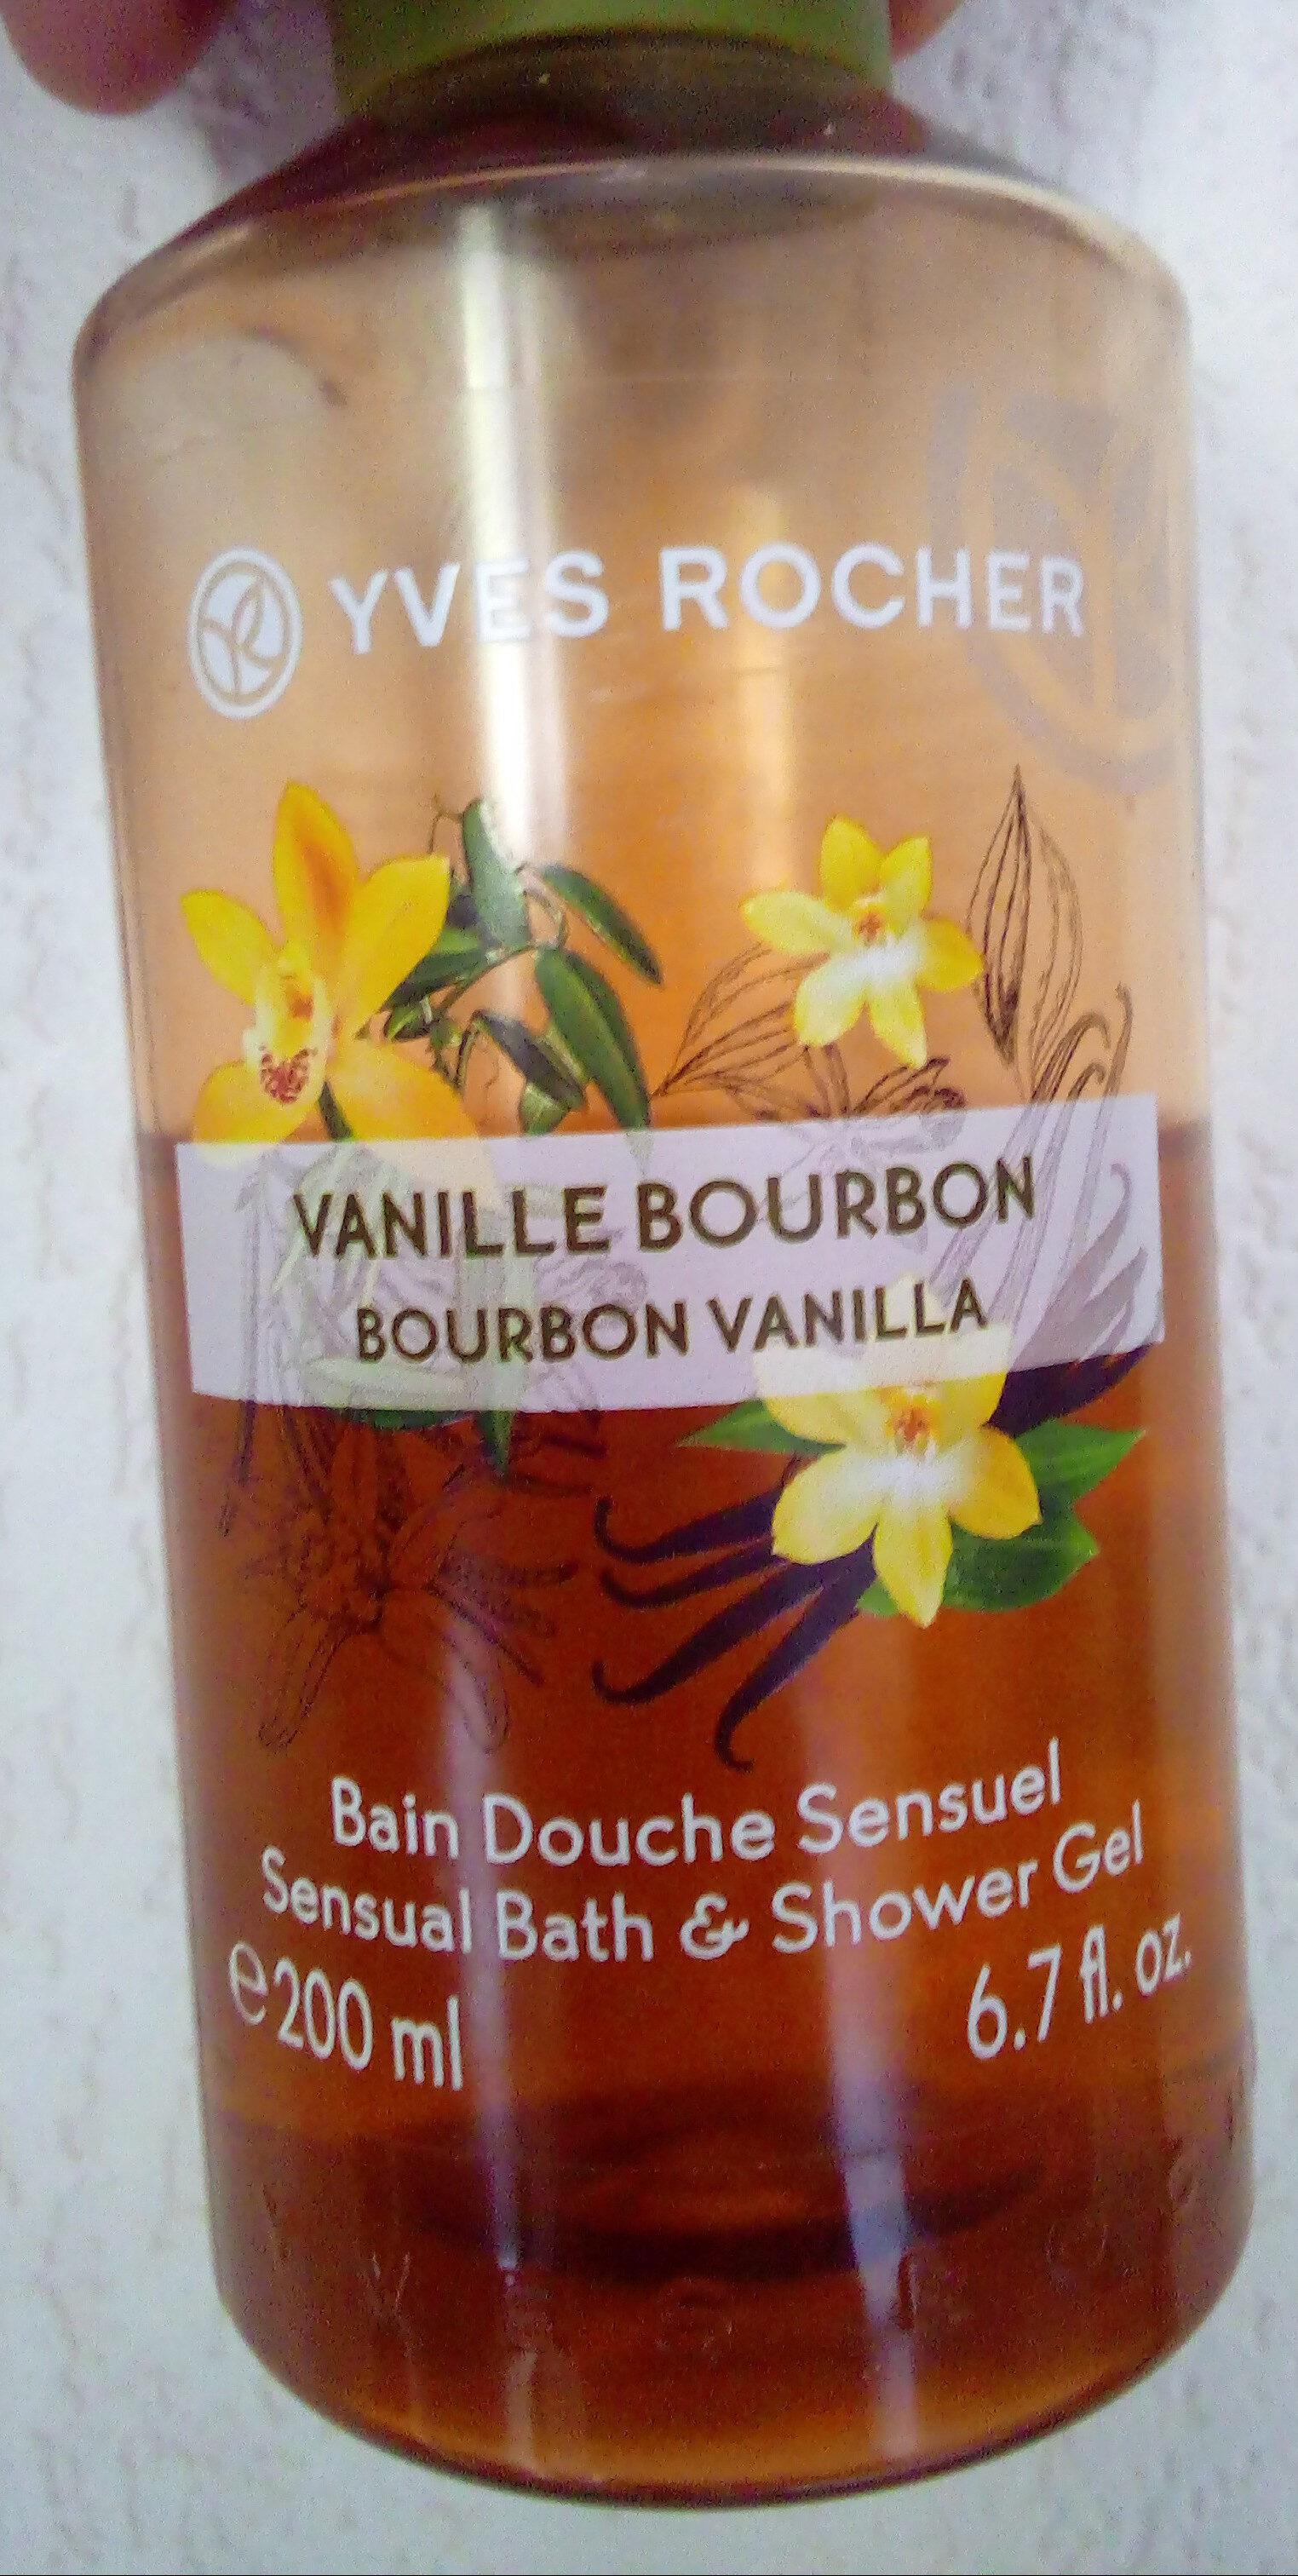 Bain douche sensuel vanille bourbon - Produit